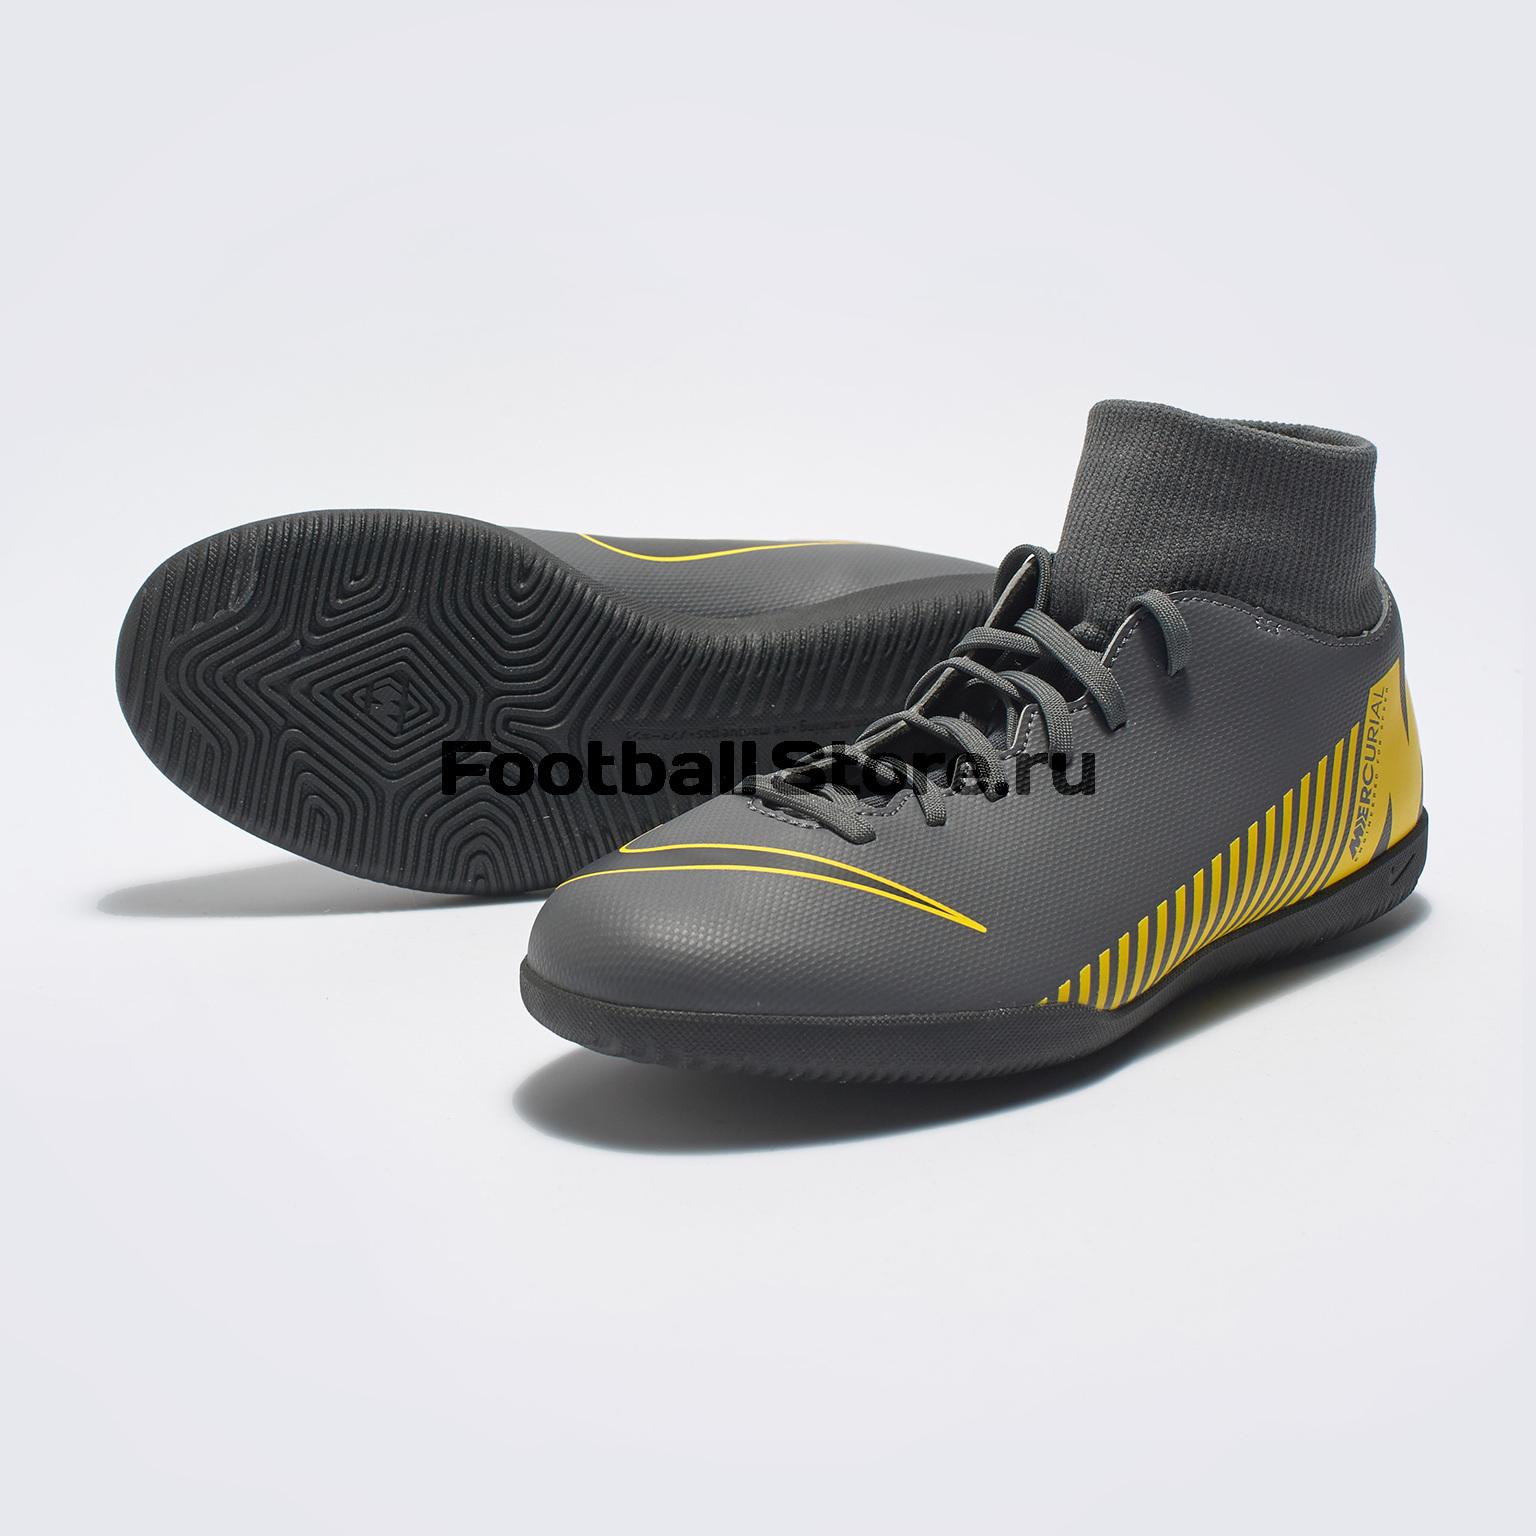 Футзалки Nike Superfly 6 Club IC AH7371-070 10pcs lmr14206xmkx sot23 6 lmr14206 sot23 sj2b smd new and original ic free shipping